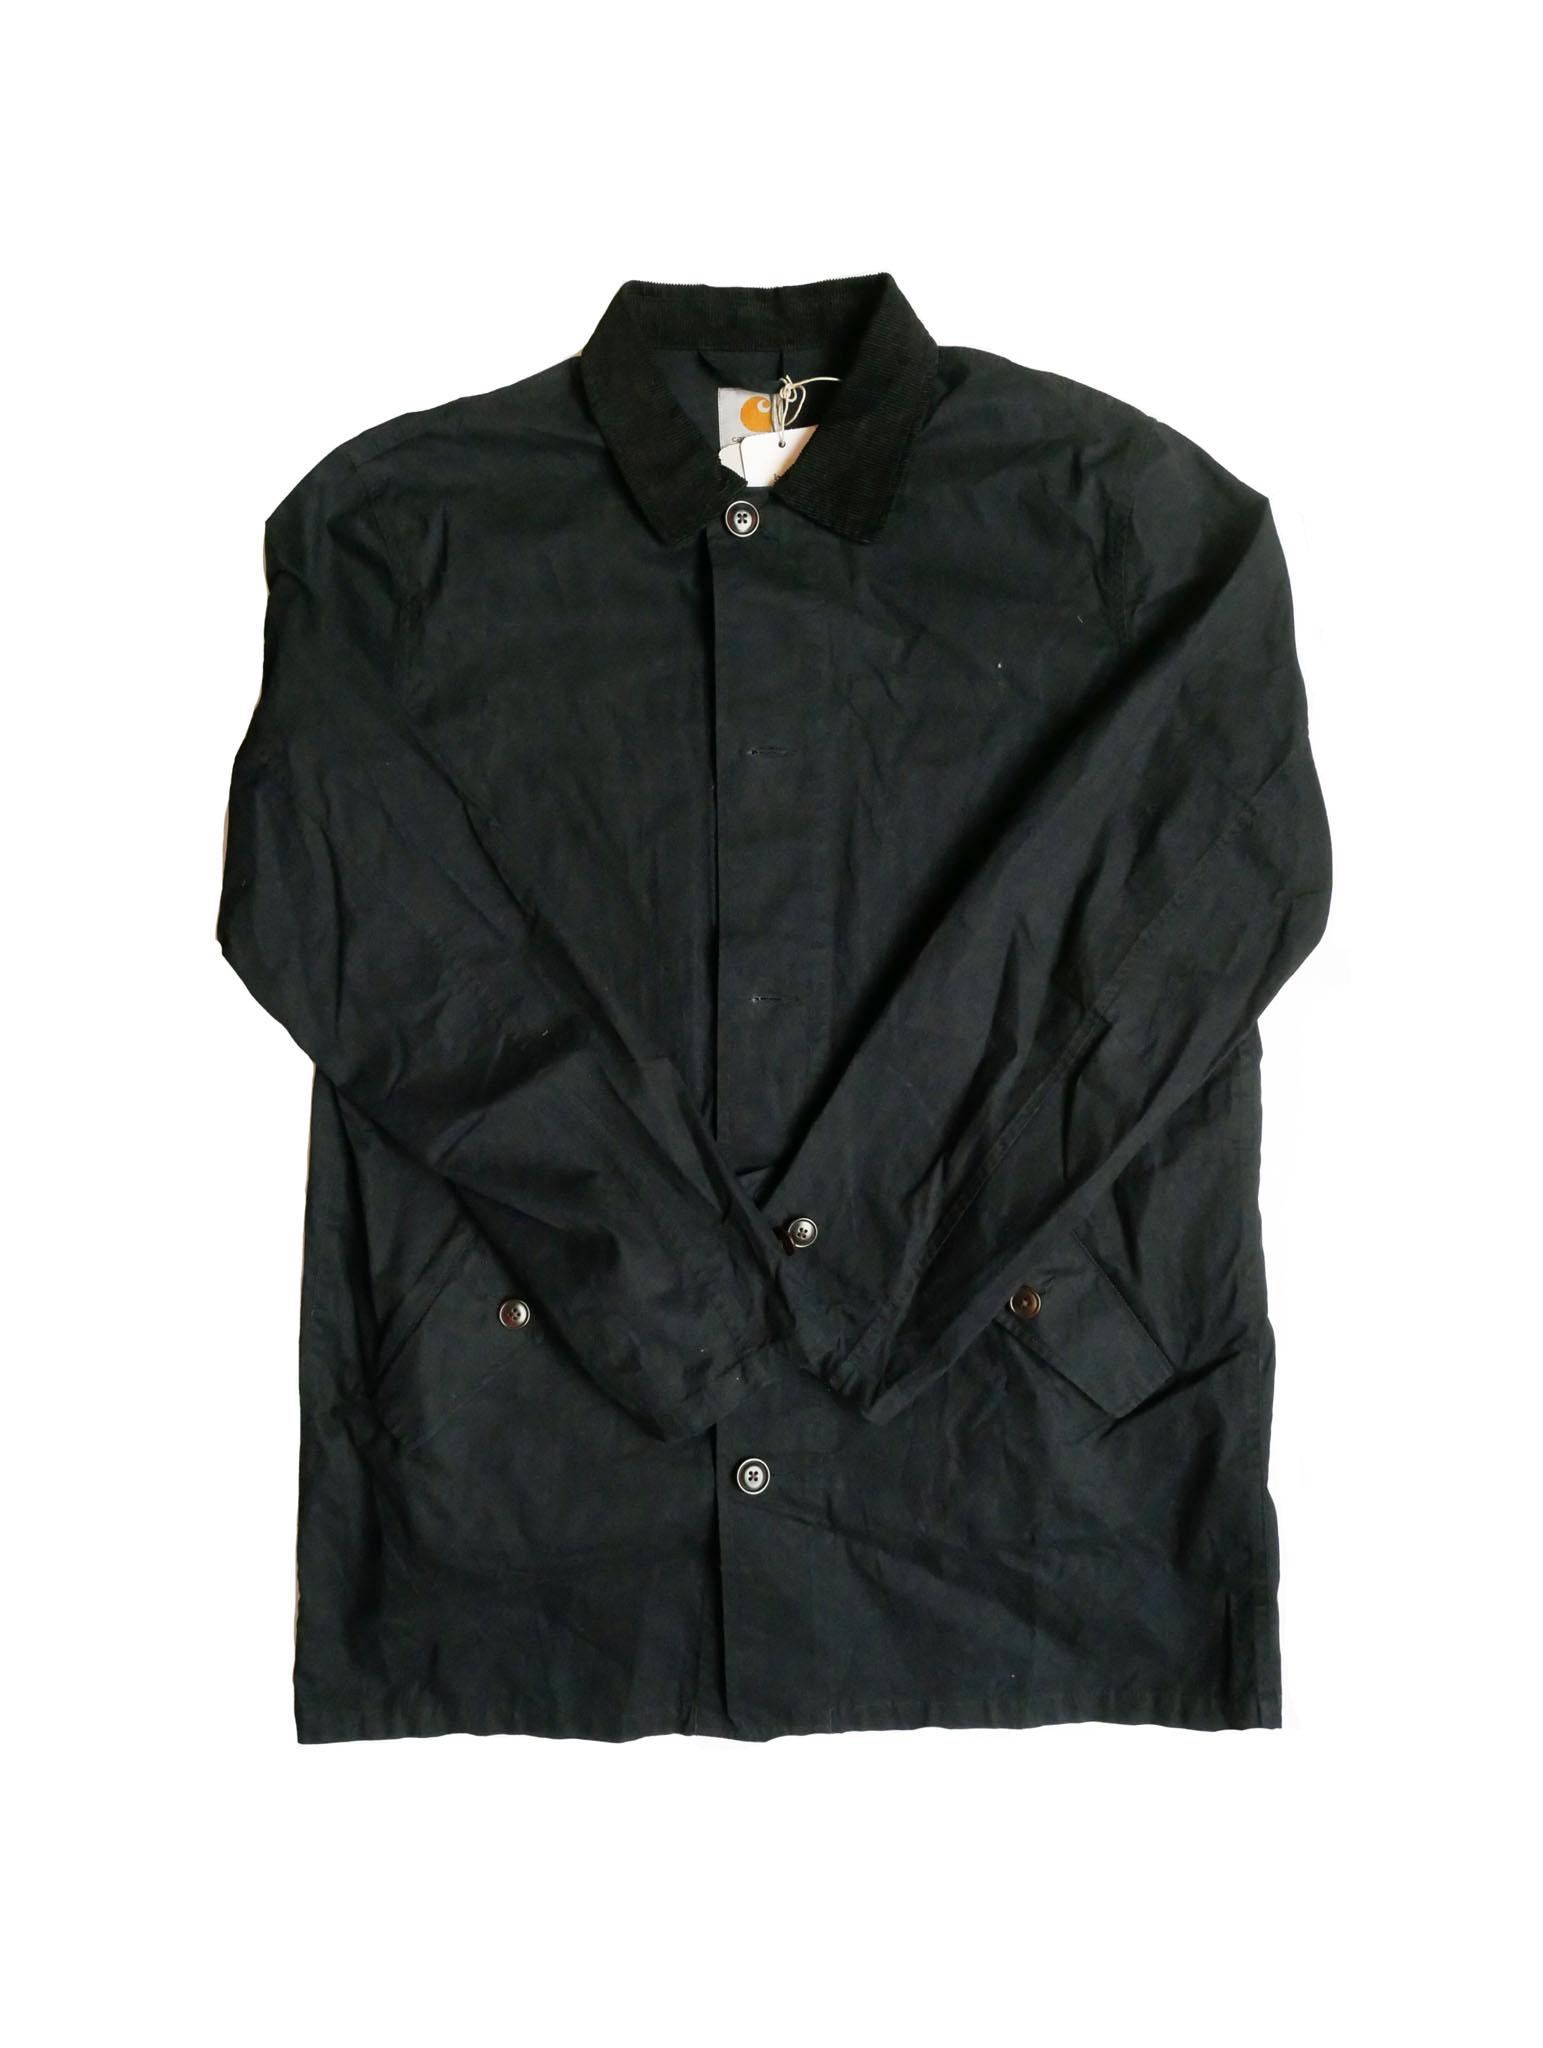 Carhartt Martin Coat Black